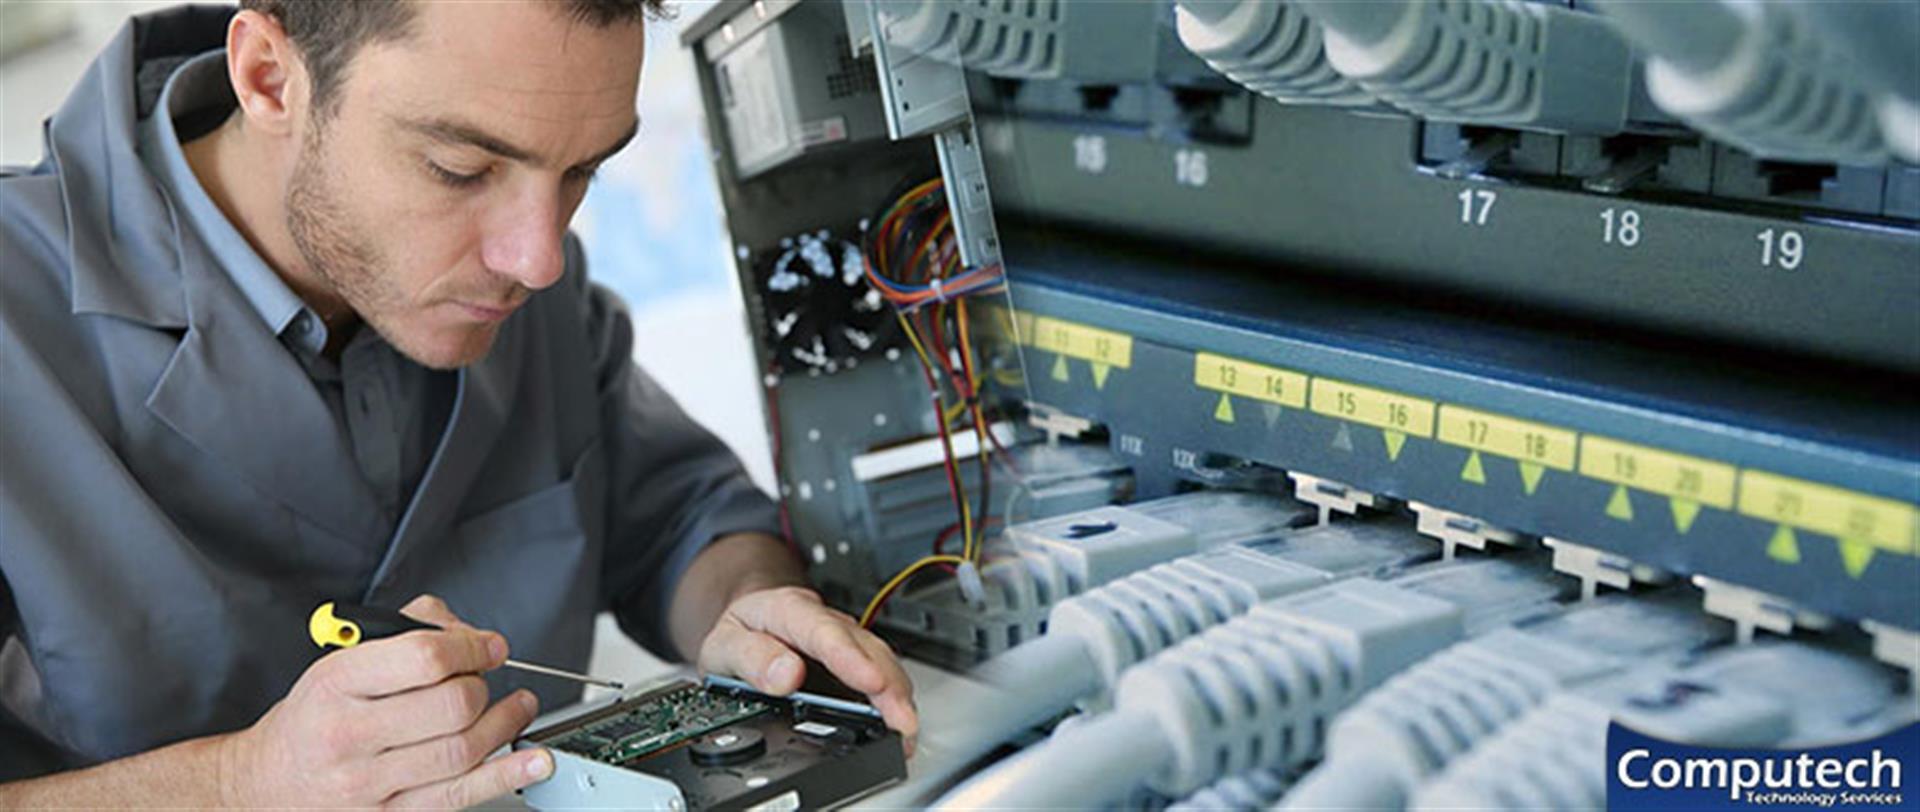 Hiram Georgia On-Site Computer PC & Printer Repairs, Networks, Voice & Data Cabling Solutions